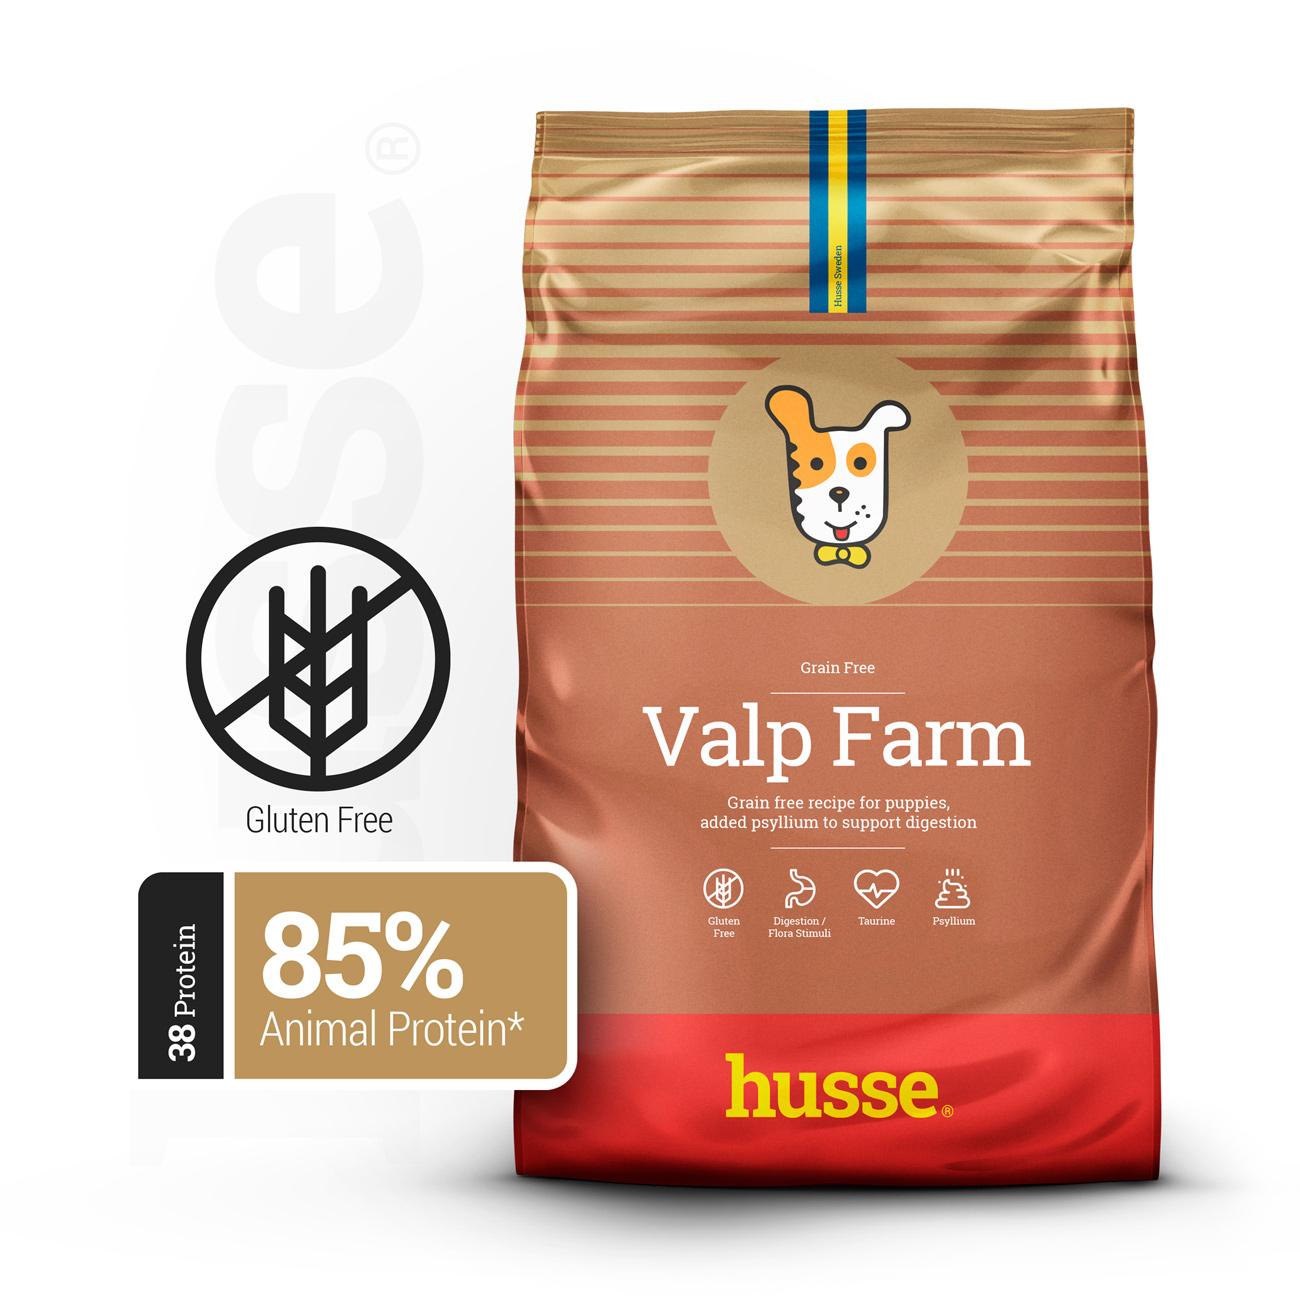 Valp Farm